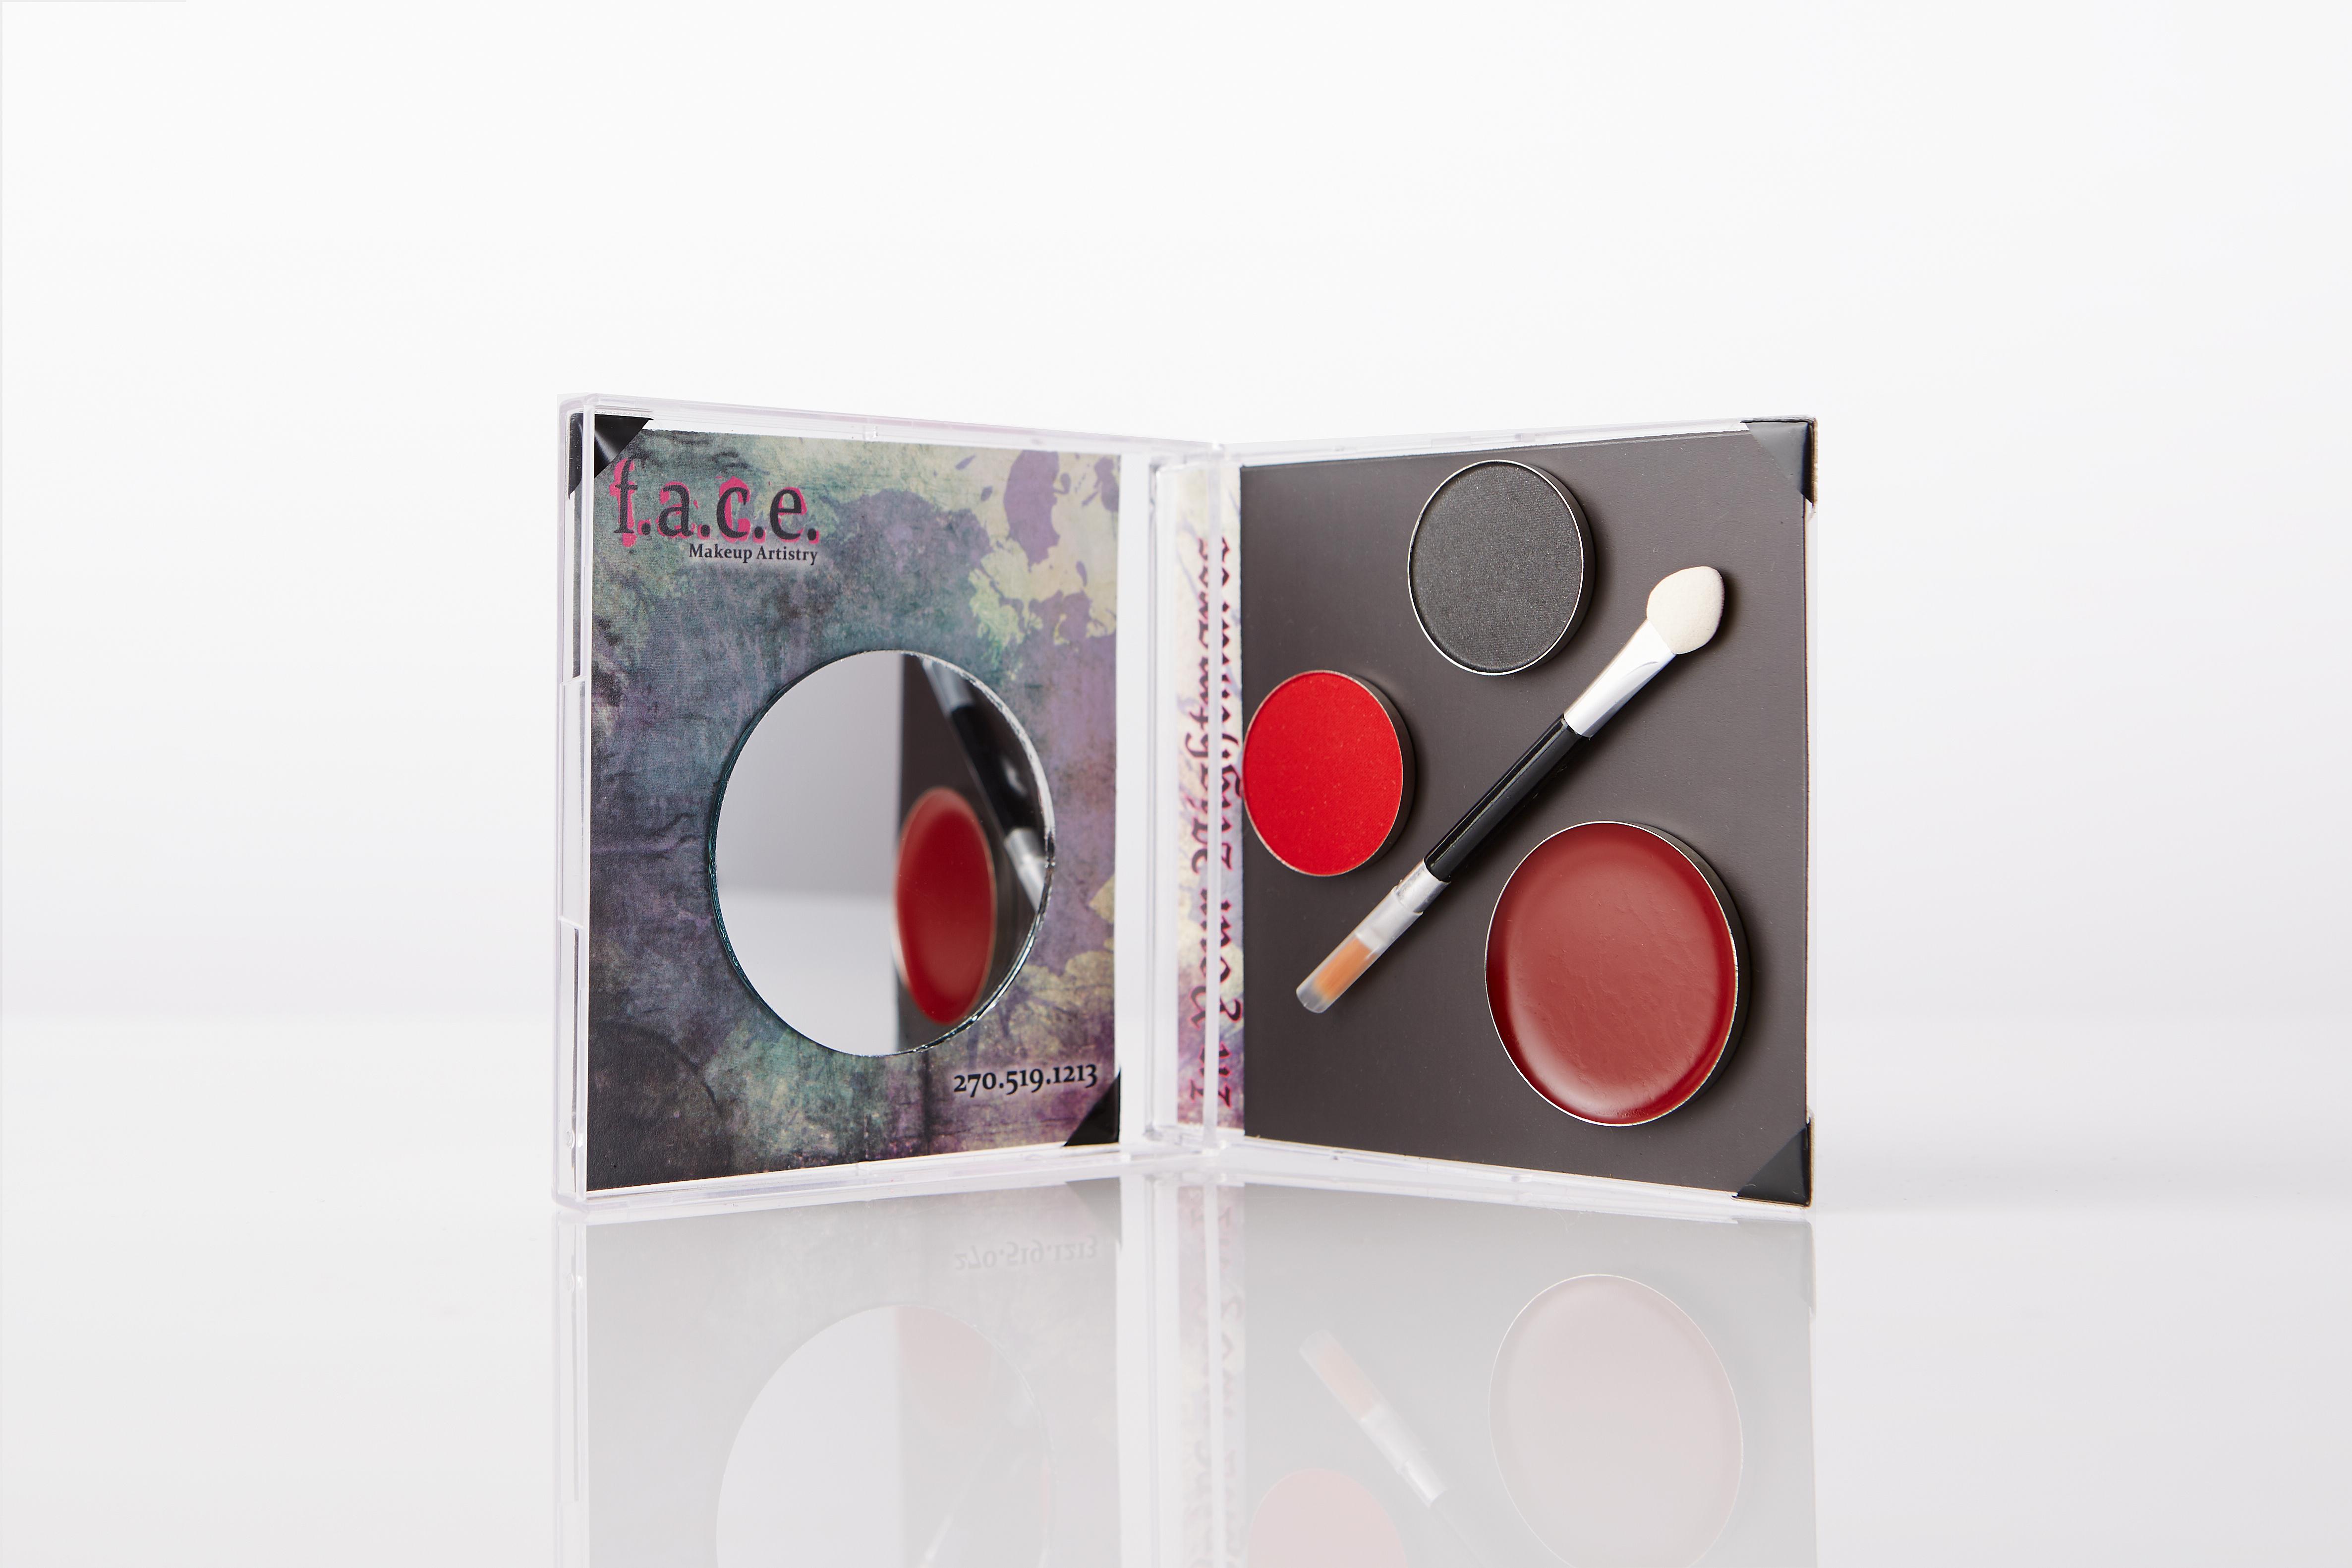 7L3A1594Erin Hendley - Brushes & Makeup Retail - June 2015 - Brad Rankin Studio